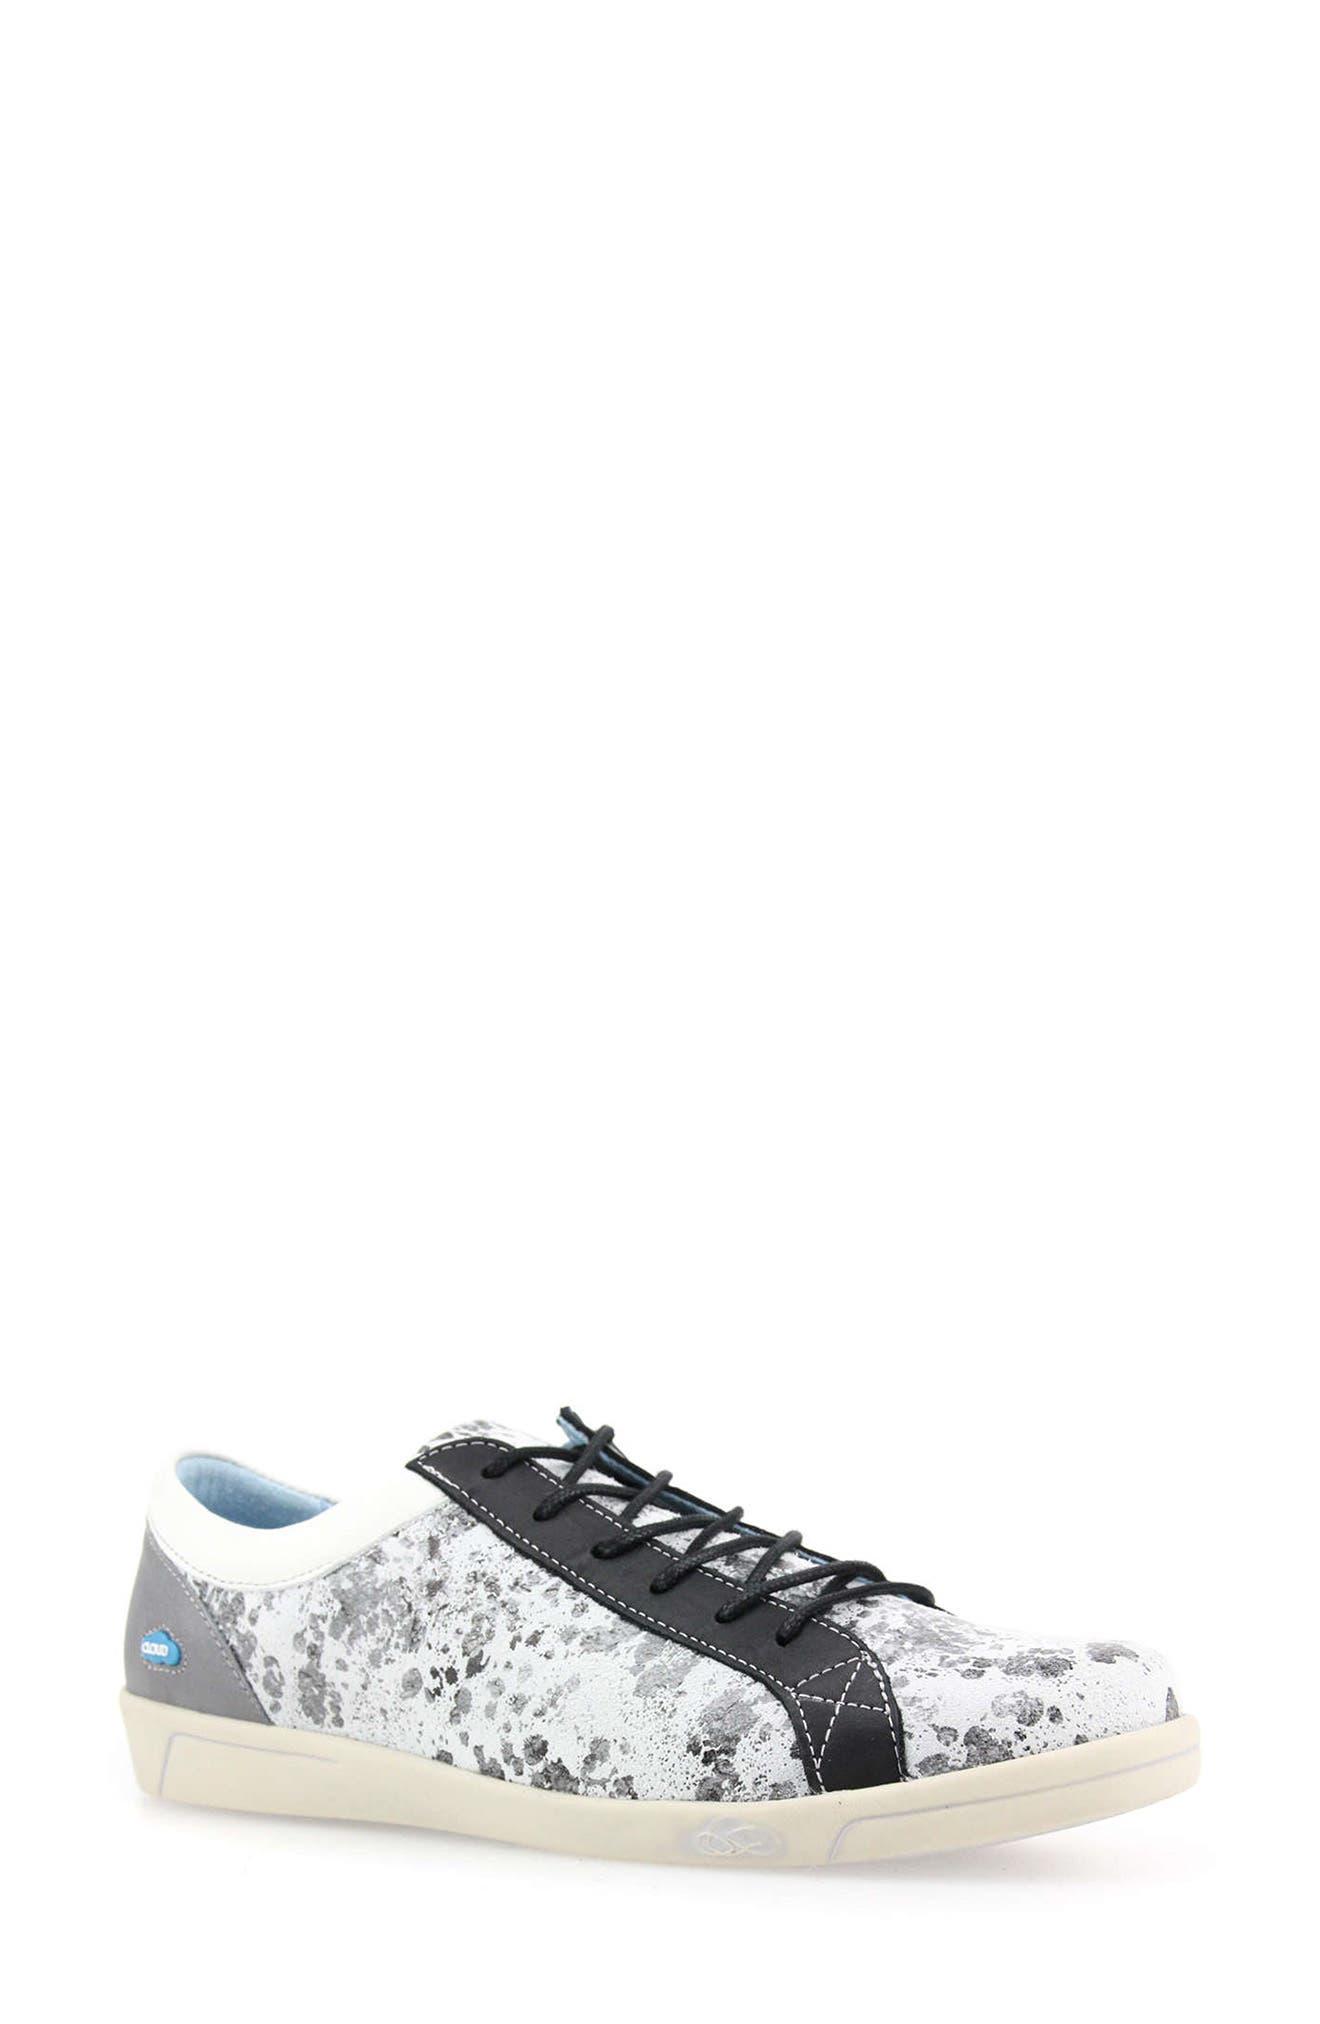 Adam Sneaker